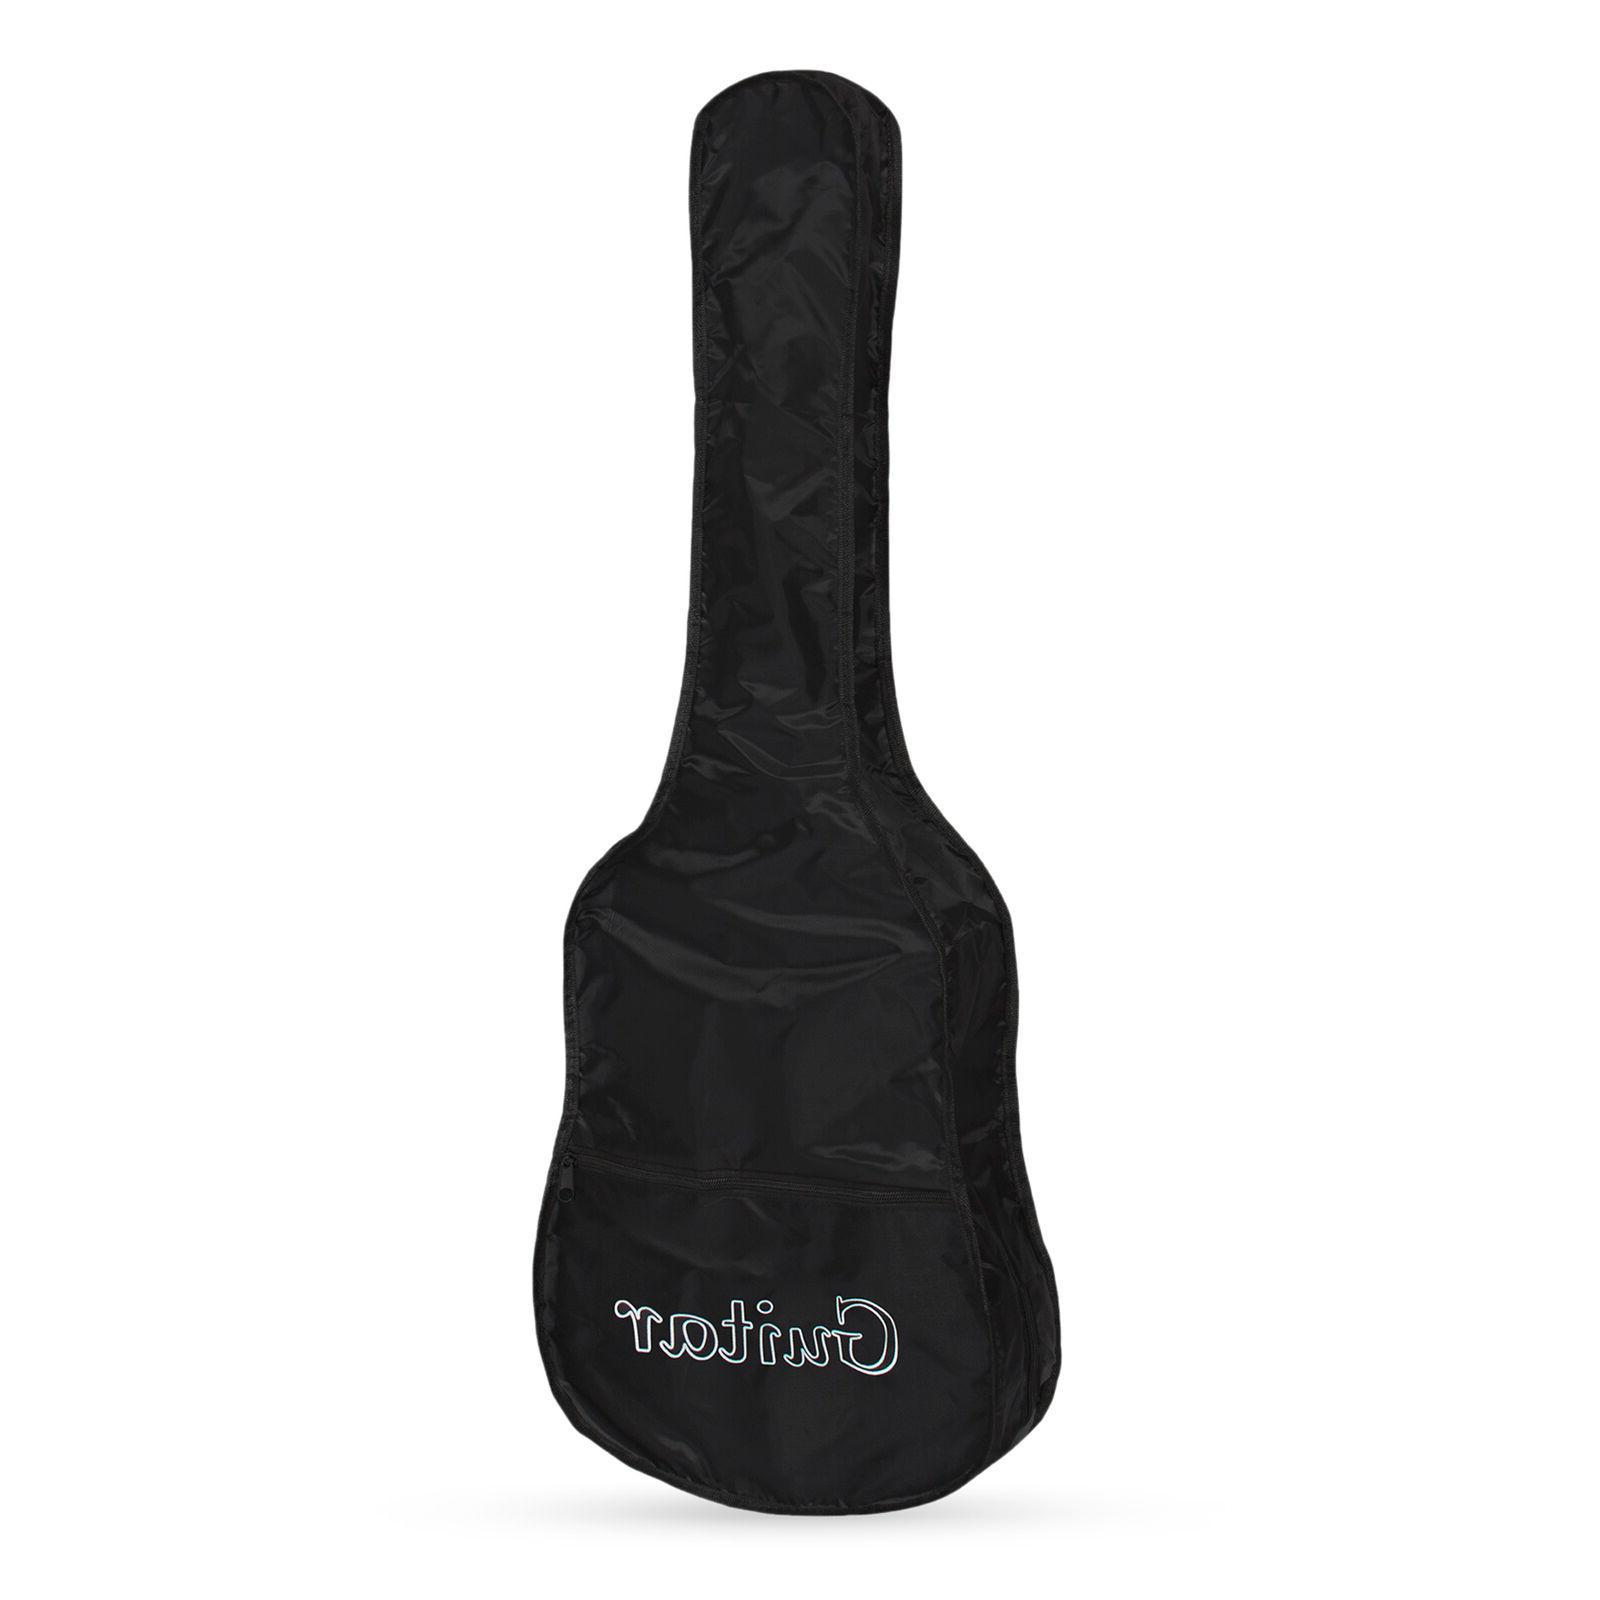 Beginner Acoustic Kit w/ Case, Strap, Digital Pick